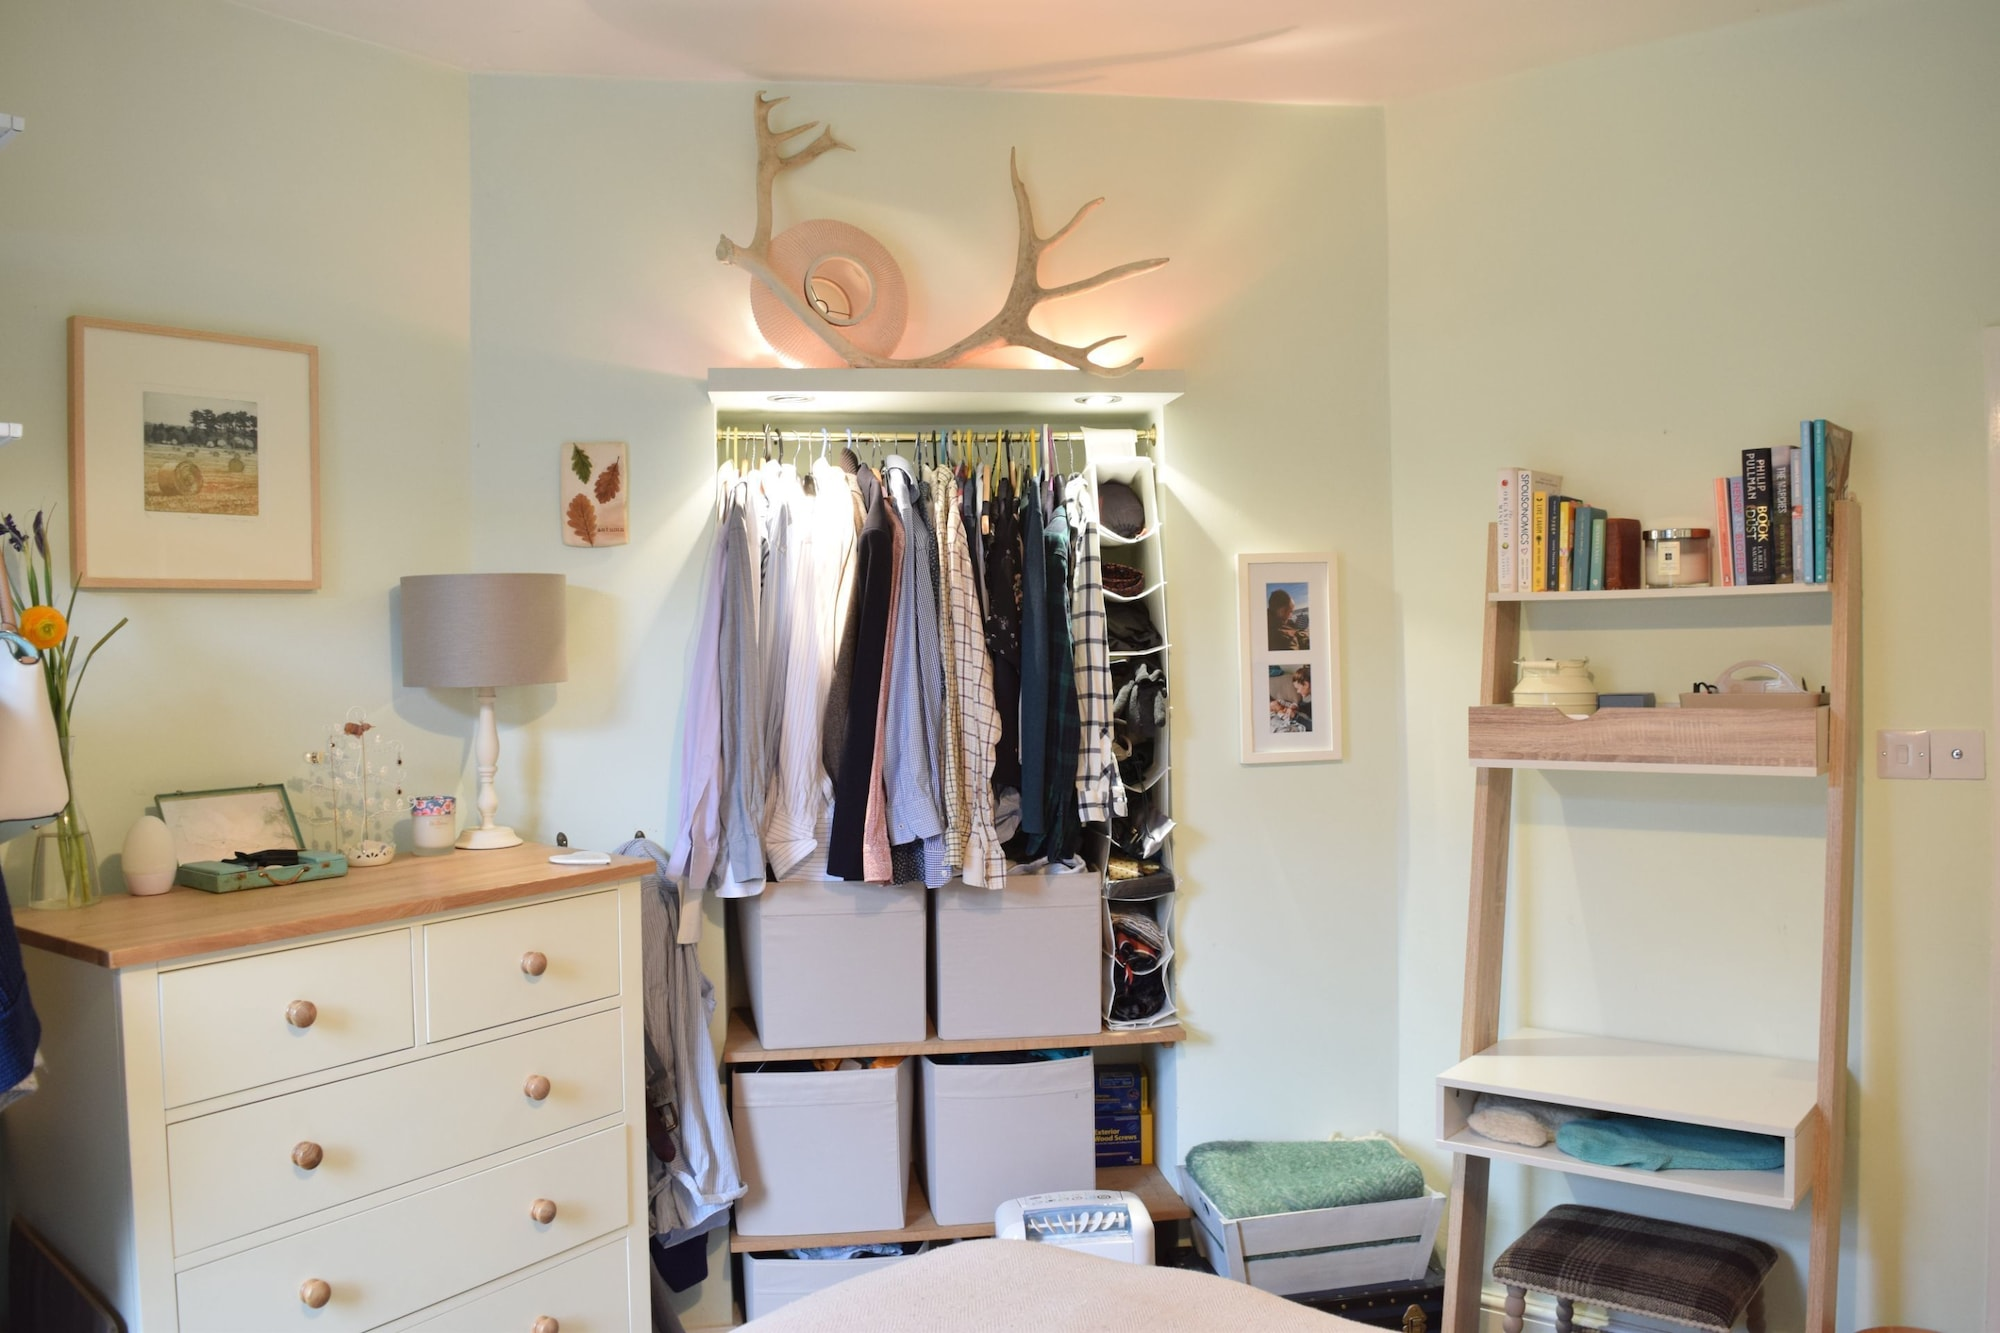 Cosy 1 Bedroom Home With Garden, London